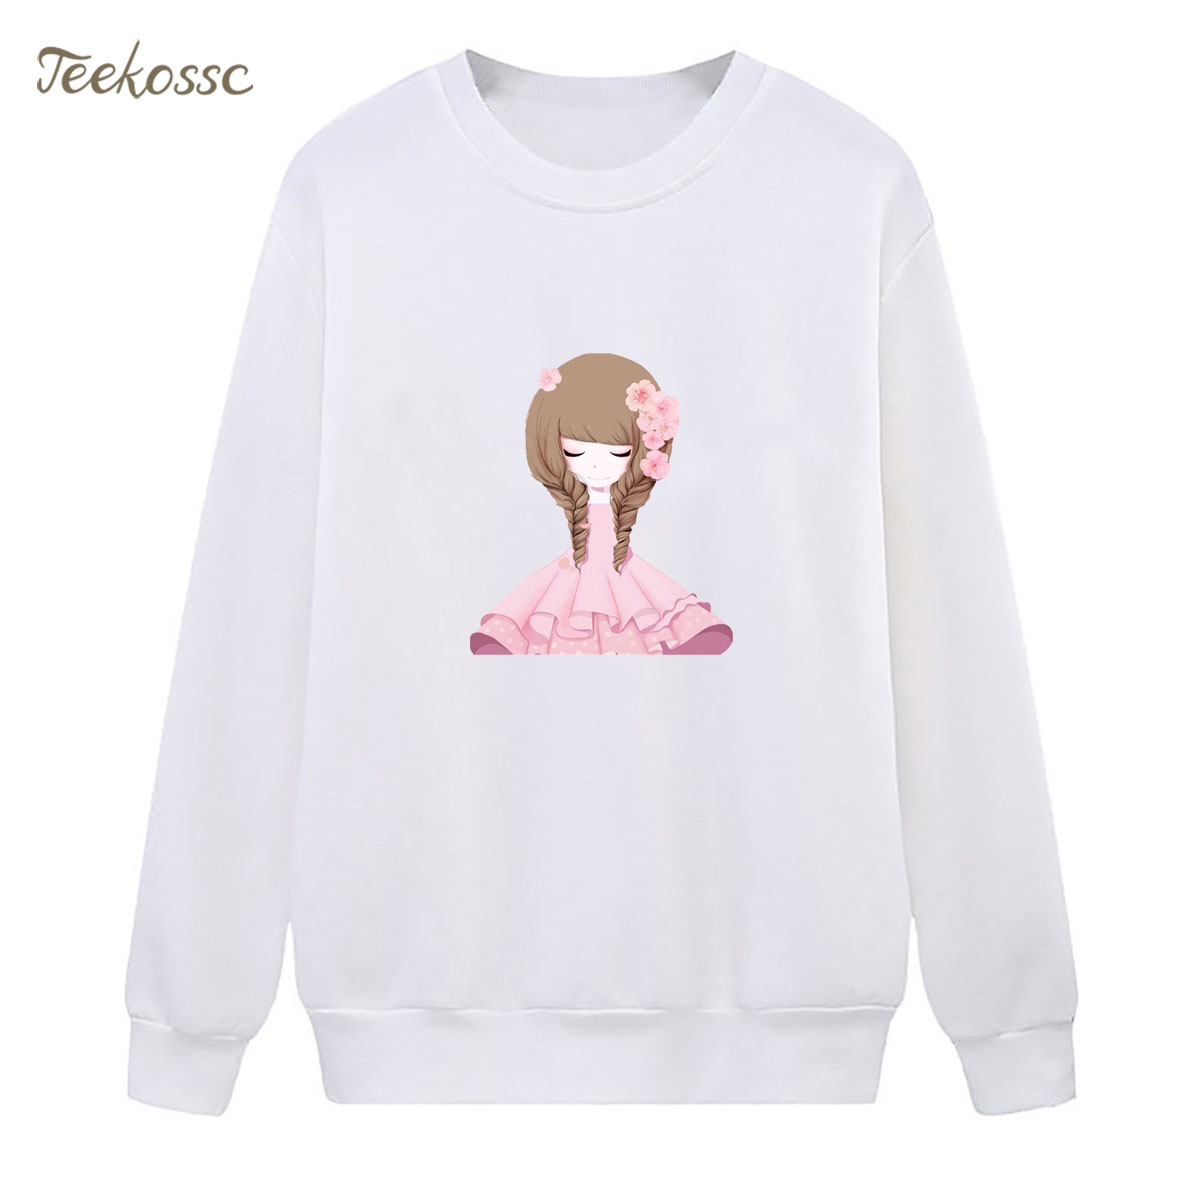 Flower Girl Sweatshirt Pink Hoodie 2018 New Brand Winter Autumn Women Lasdies Pullover Fleece Warm Loose Fit Casual Streetwear